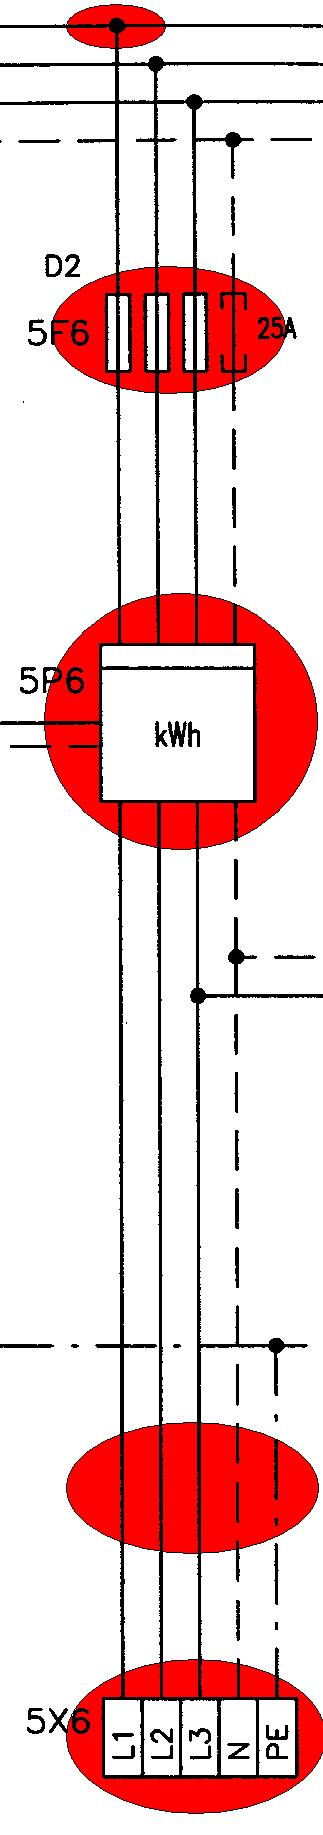 elektroschema symbole bsp